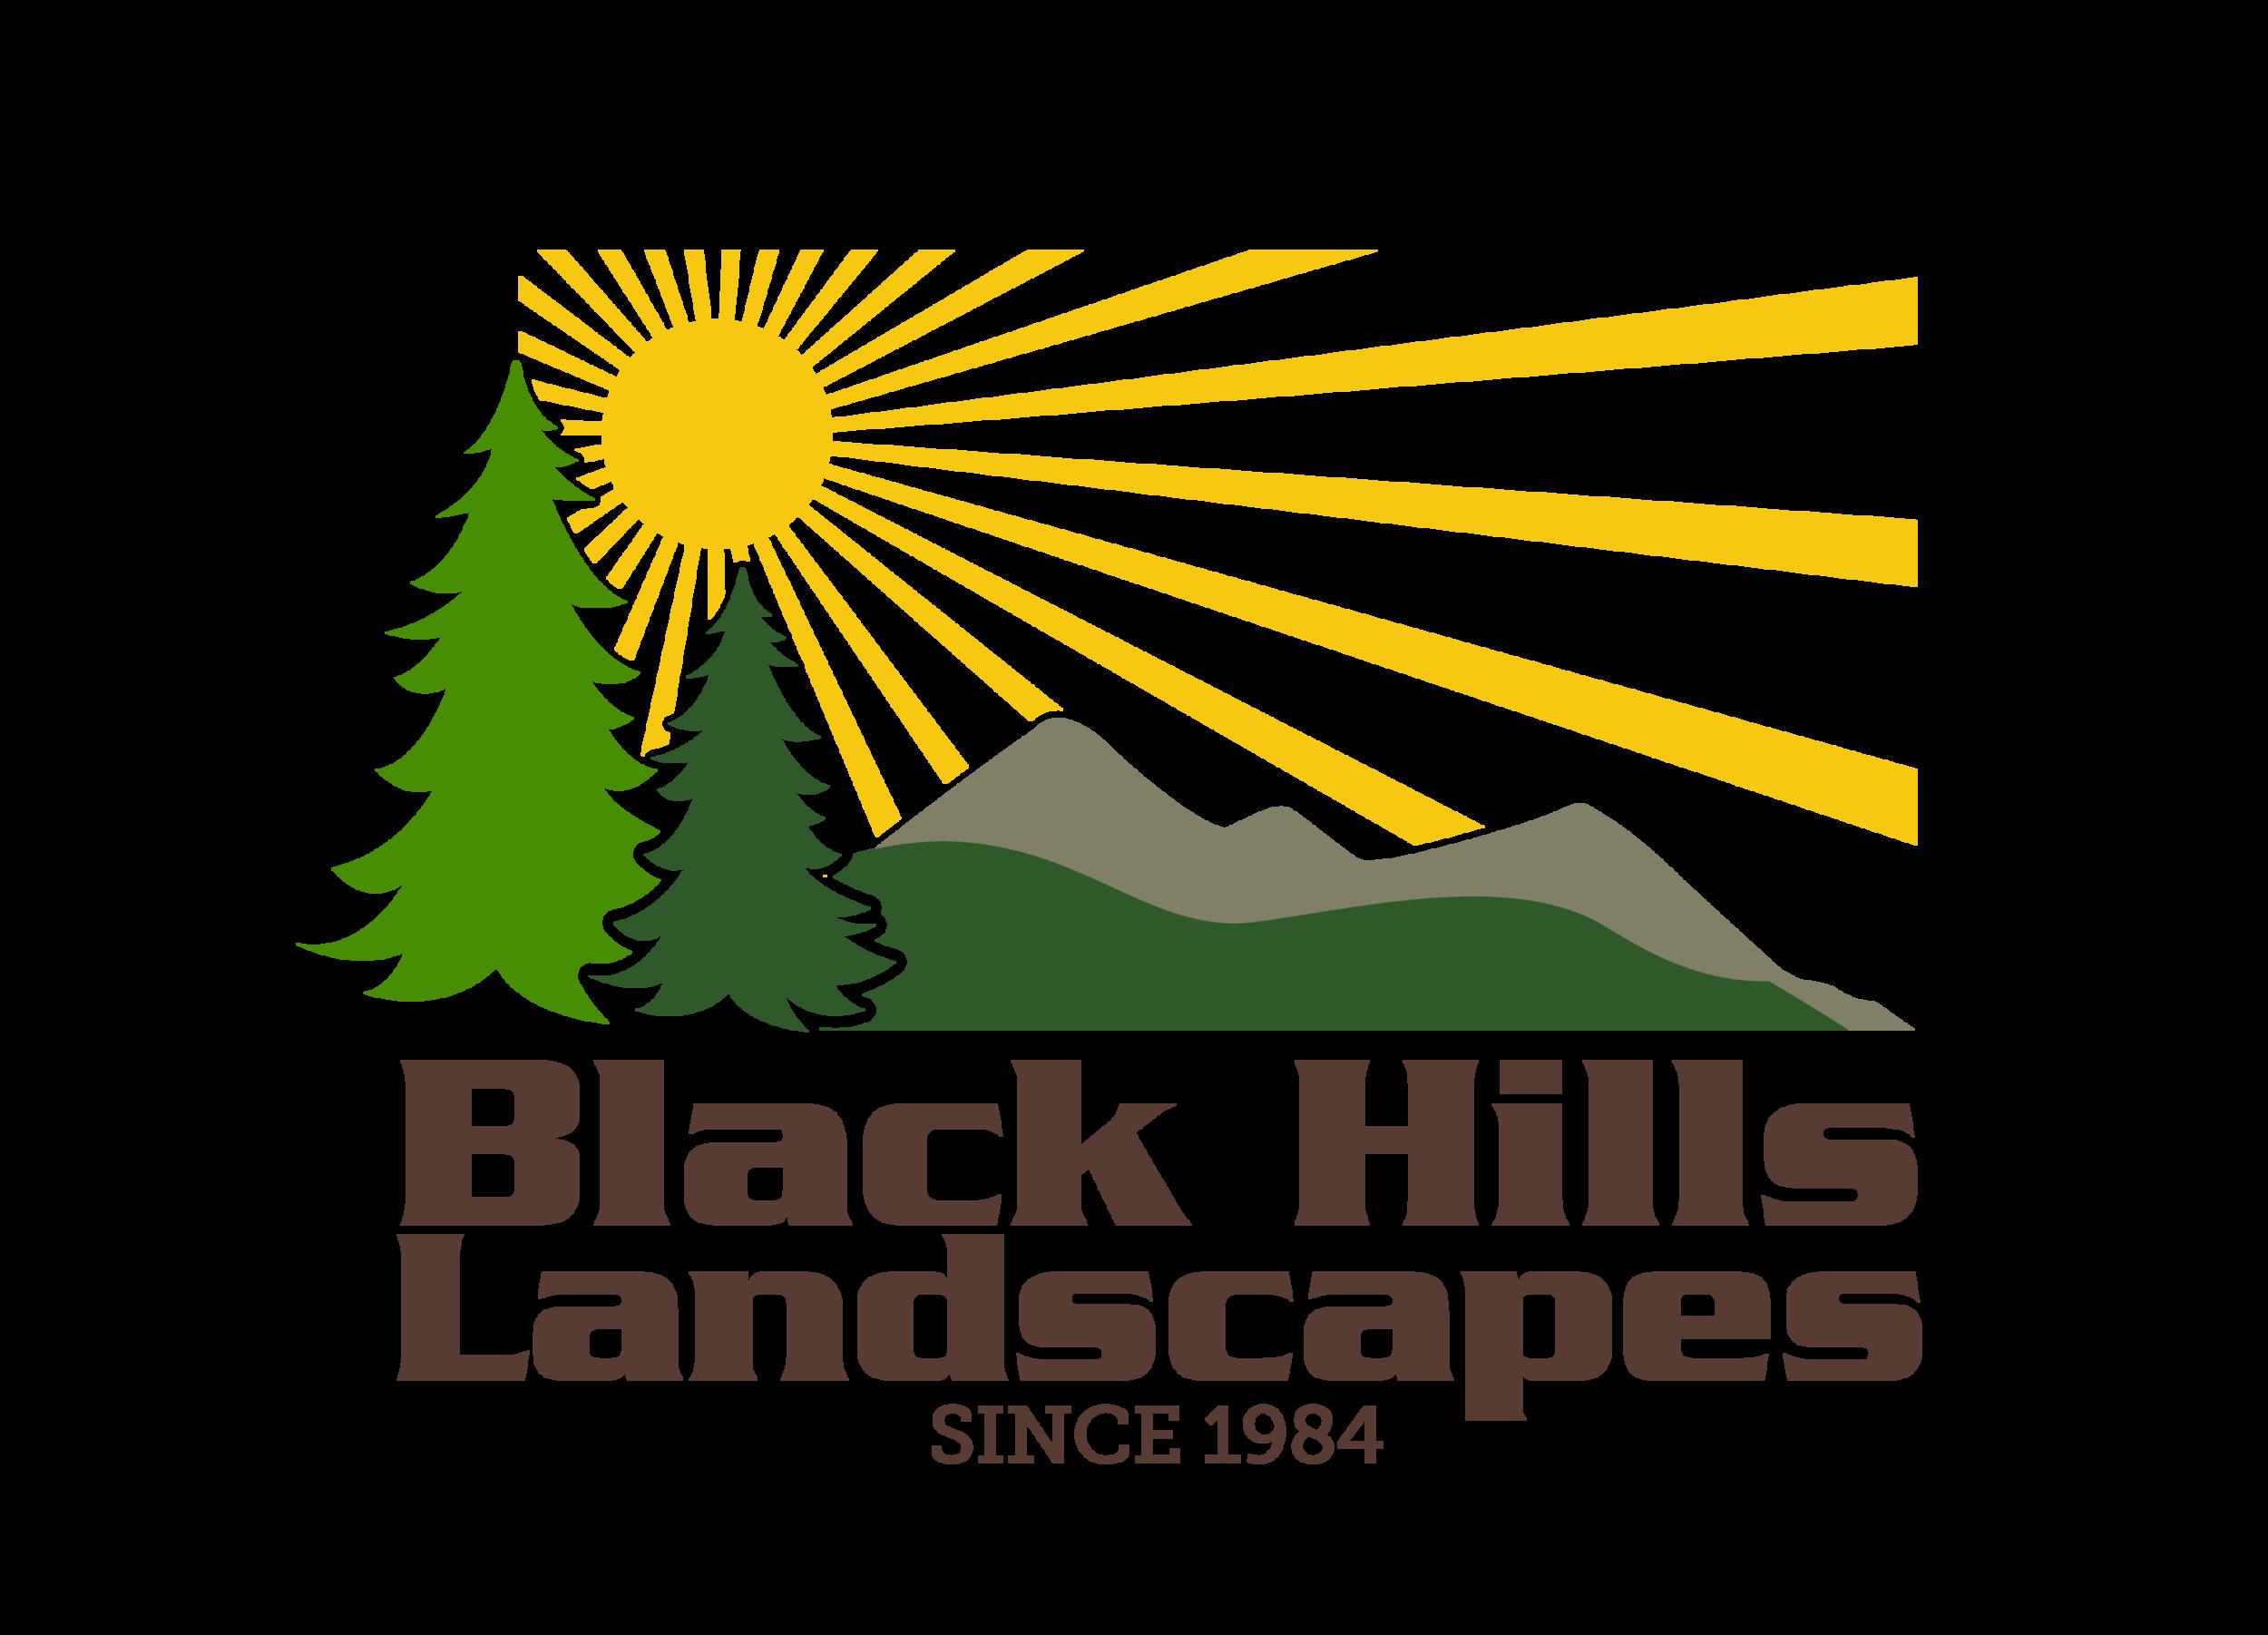 black hills_c1.png